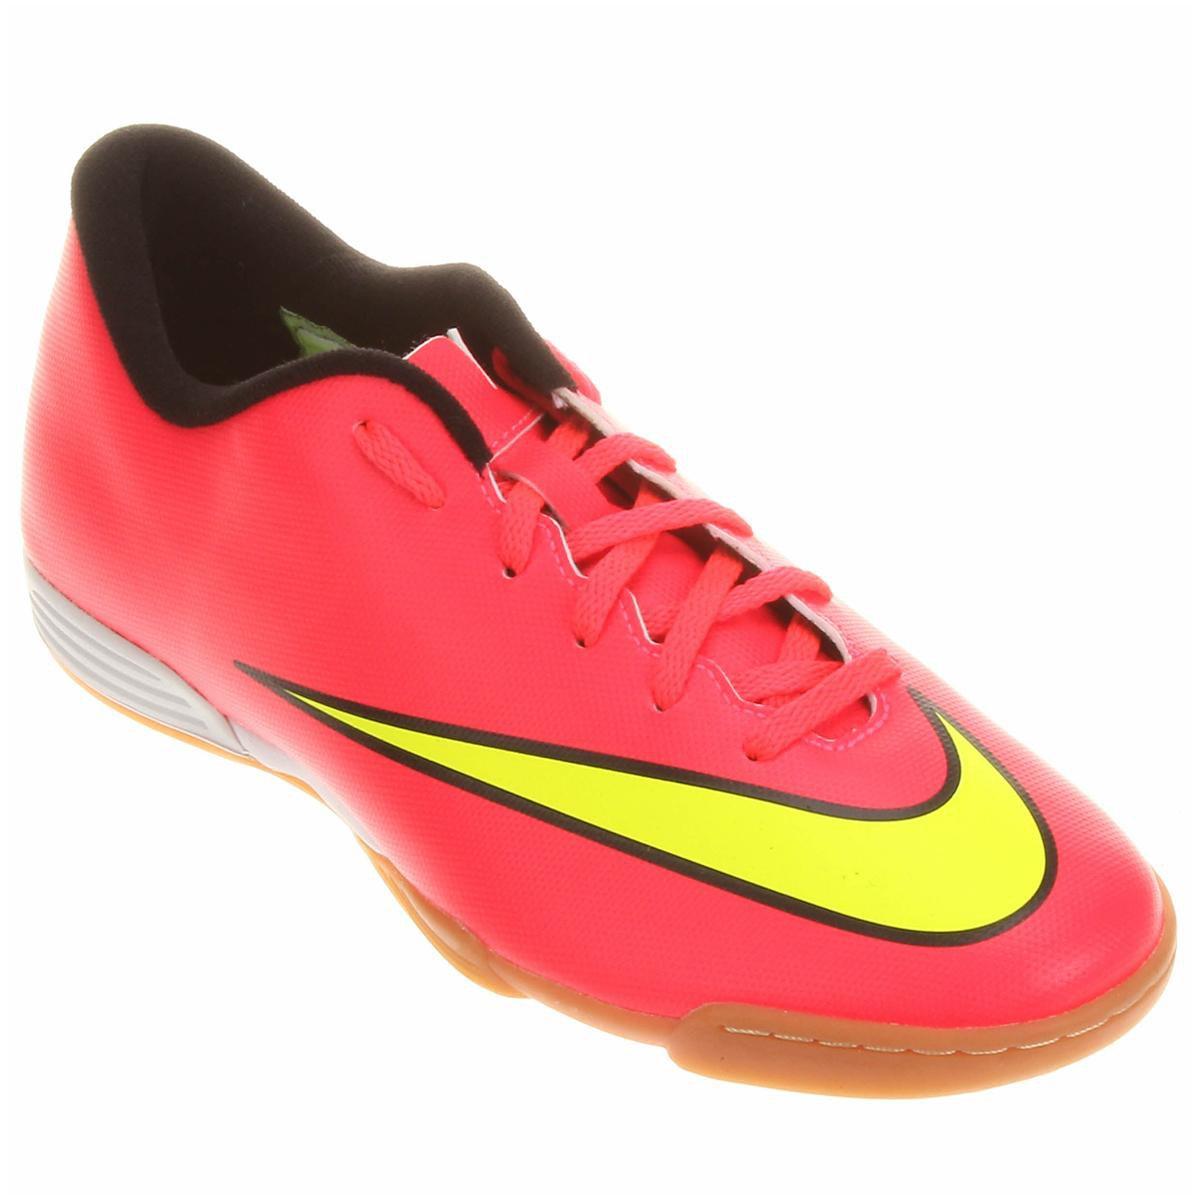 Chuteira Futsal Nike Mercurial Vortex 2 IC - Compre Agora   Netshoes 4a4bf957dc